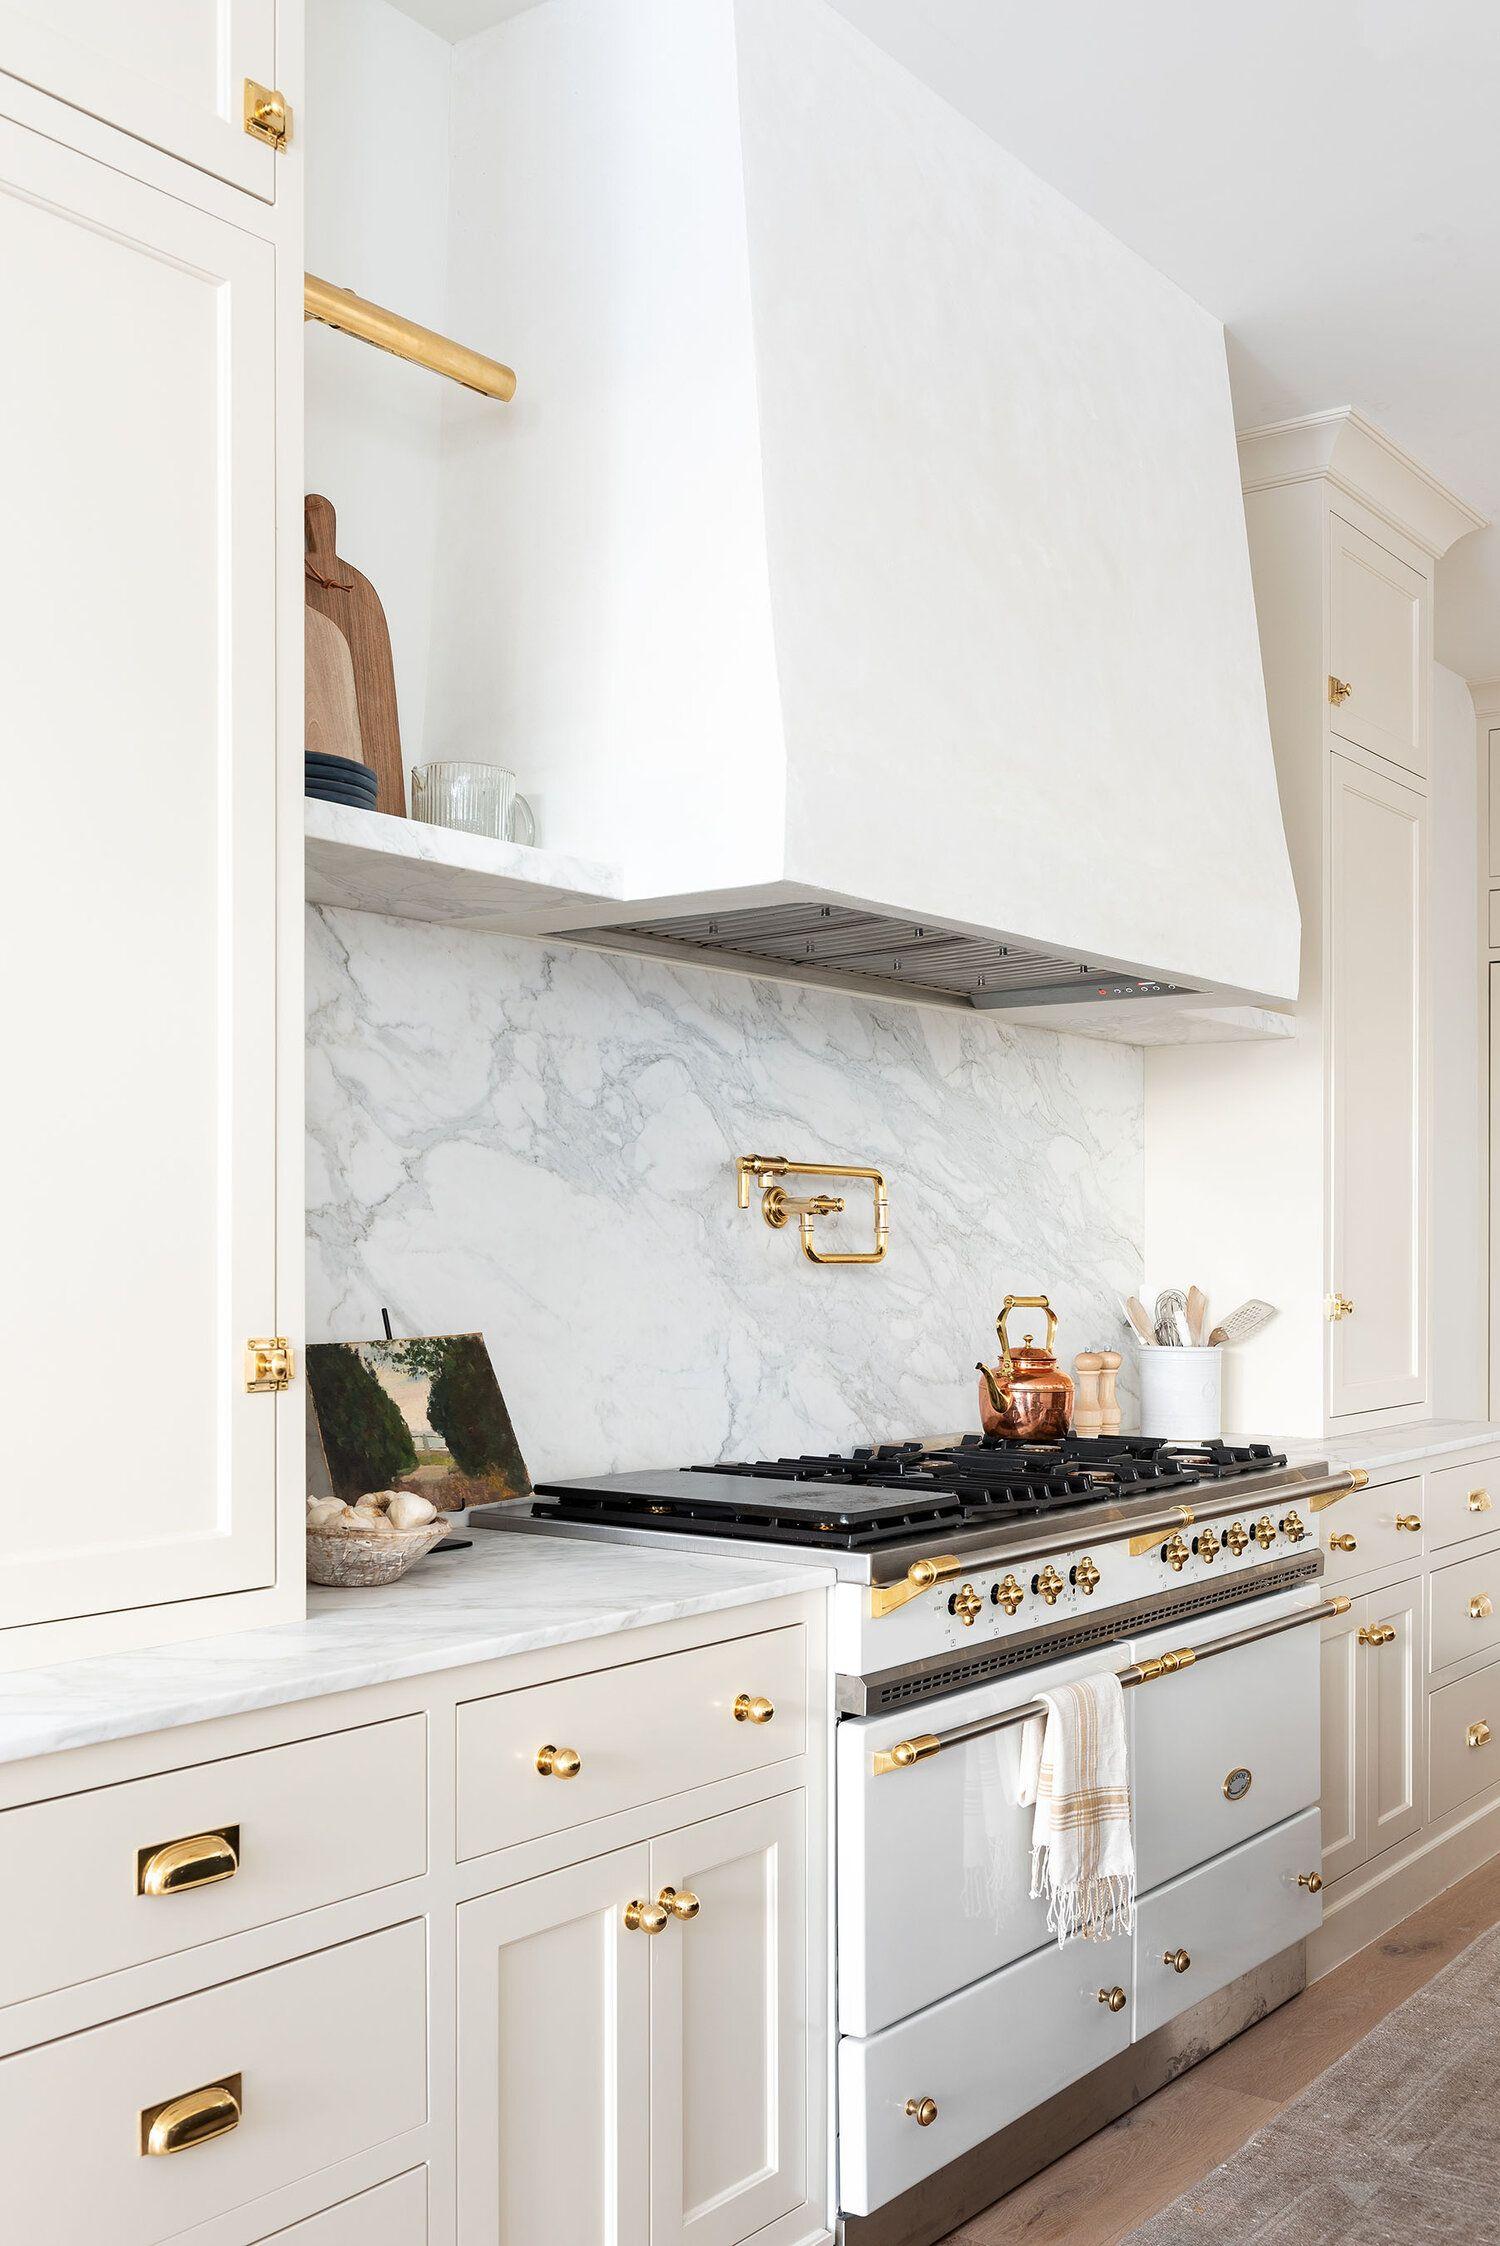 The Mcgee Home Kitchen Tour Studio Mcgee Kitchen Design Plans Kitchen Inspirations Home Kitchens